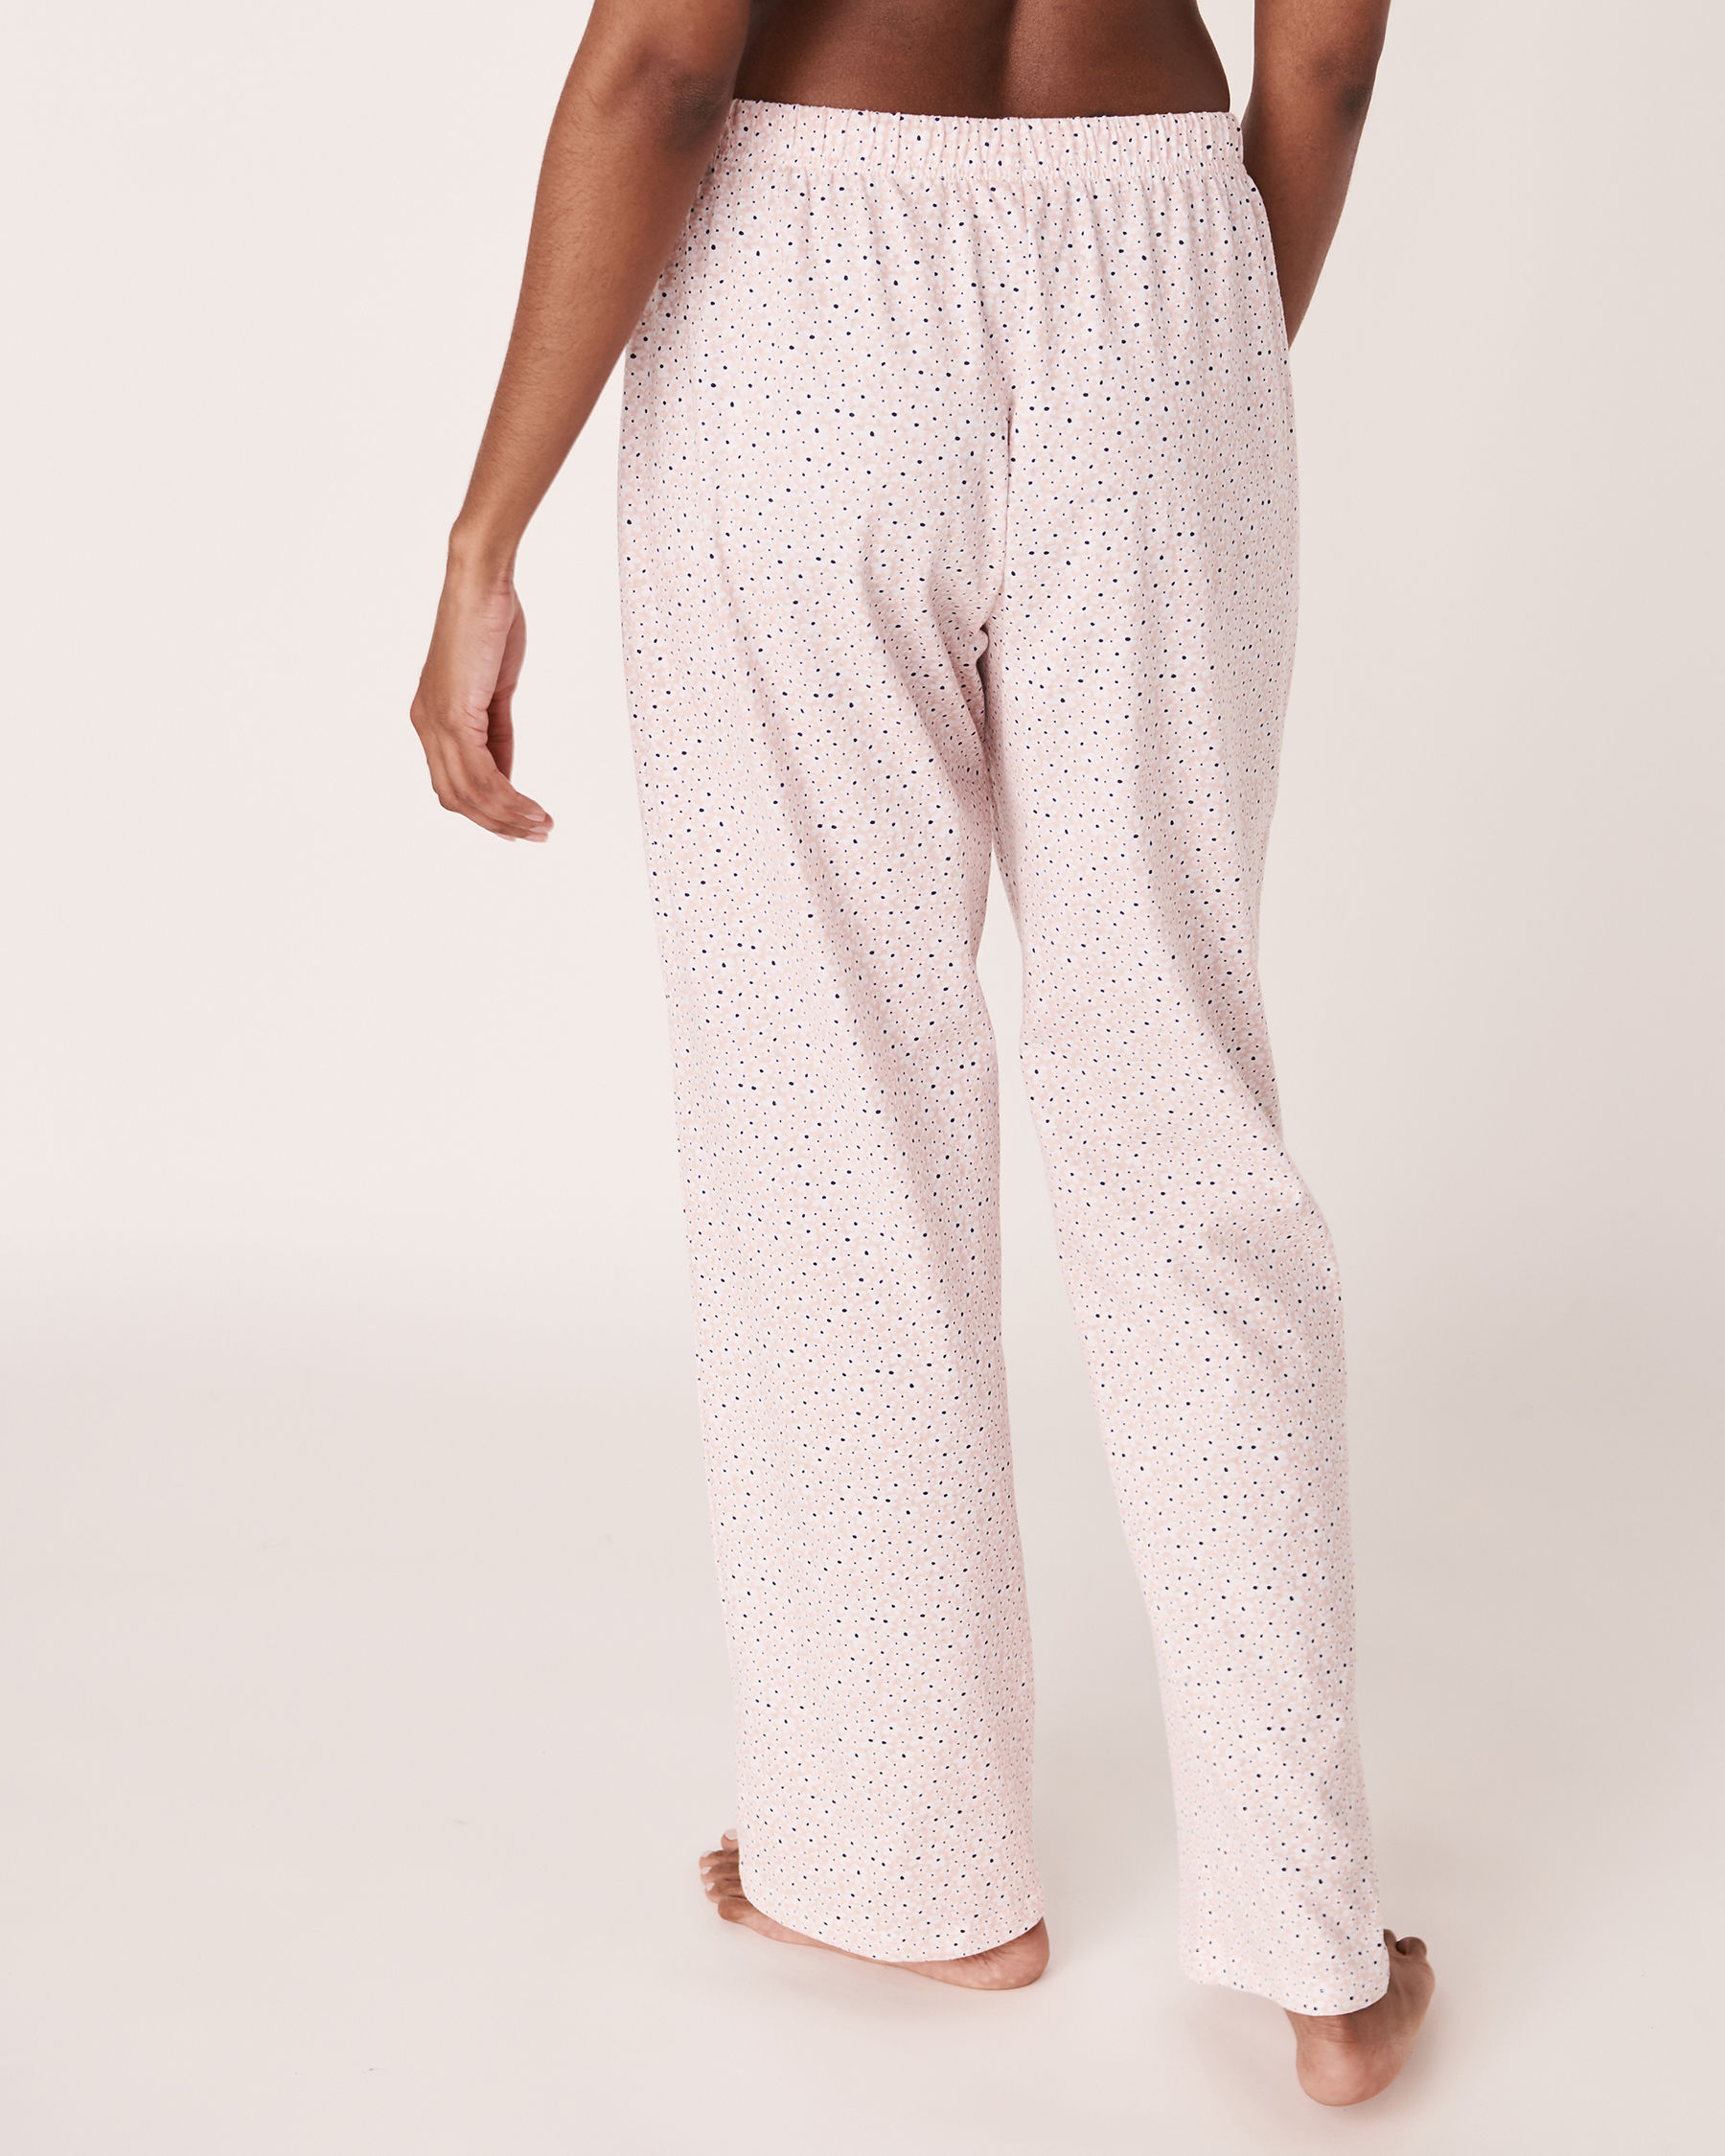 LA VIE EN ROSE Straight Leg Pyjama Pant Flowers 40200110 - View4